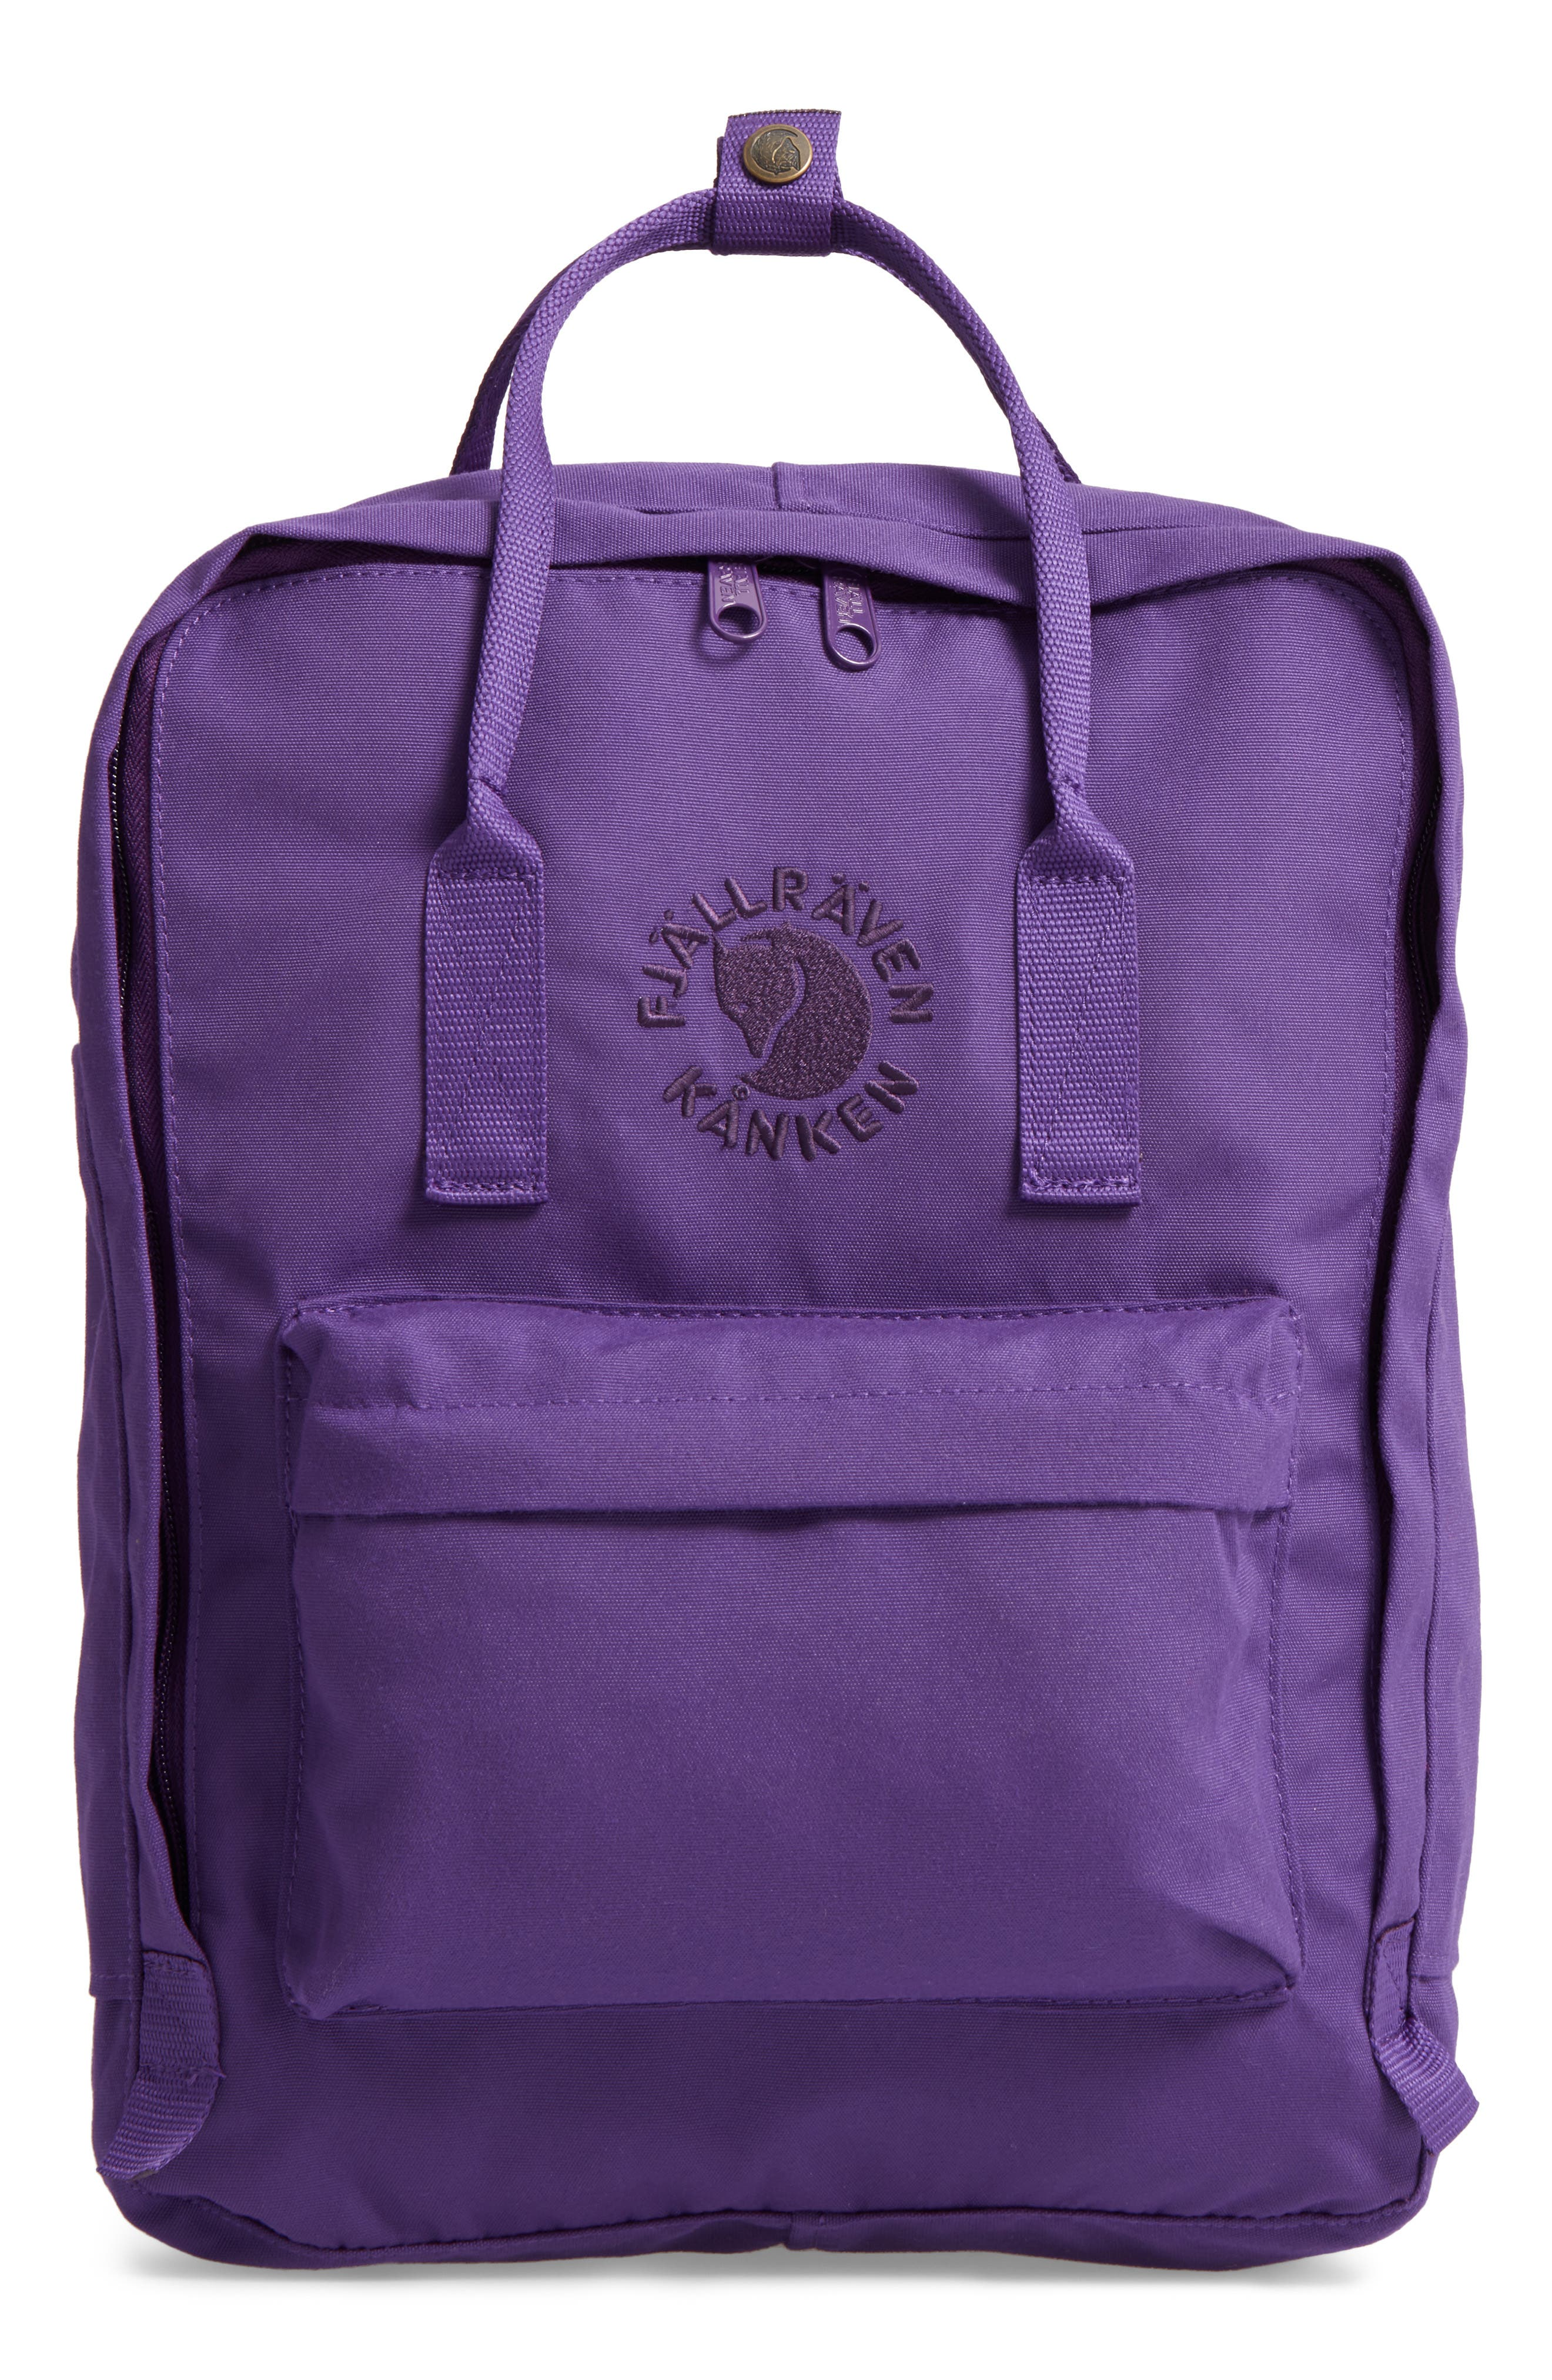 Re-Kånken Water Resistant Backpack,                             Main thumbnail 1, color,                             DEEP VIOLET